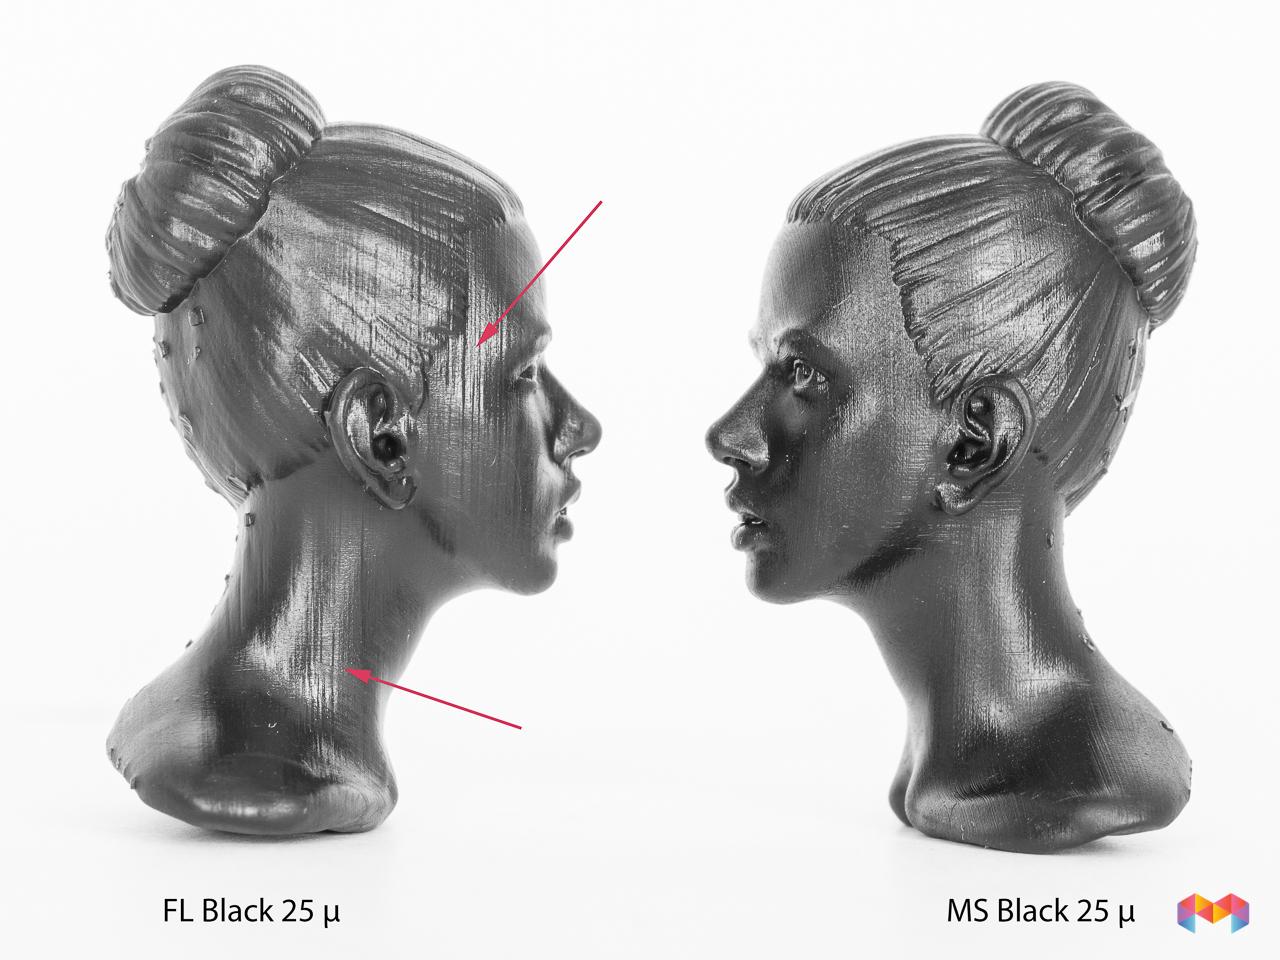 3D_printed_heads